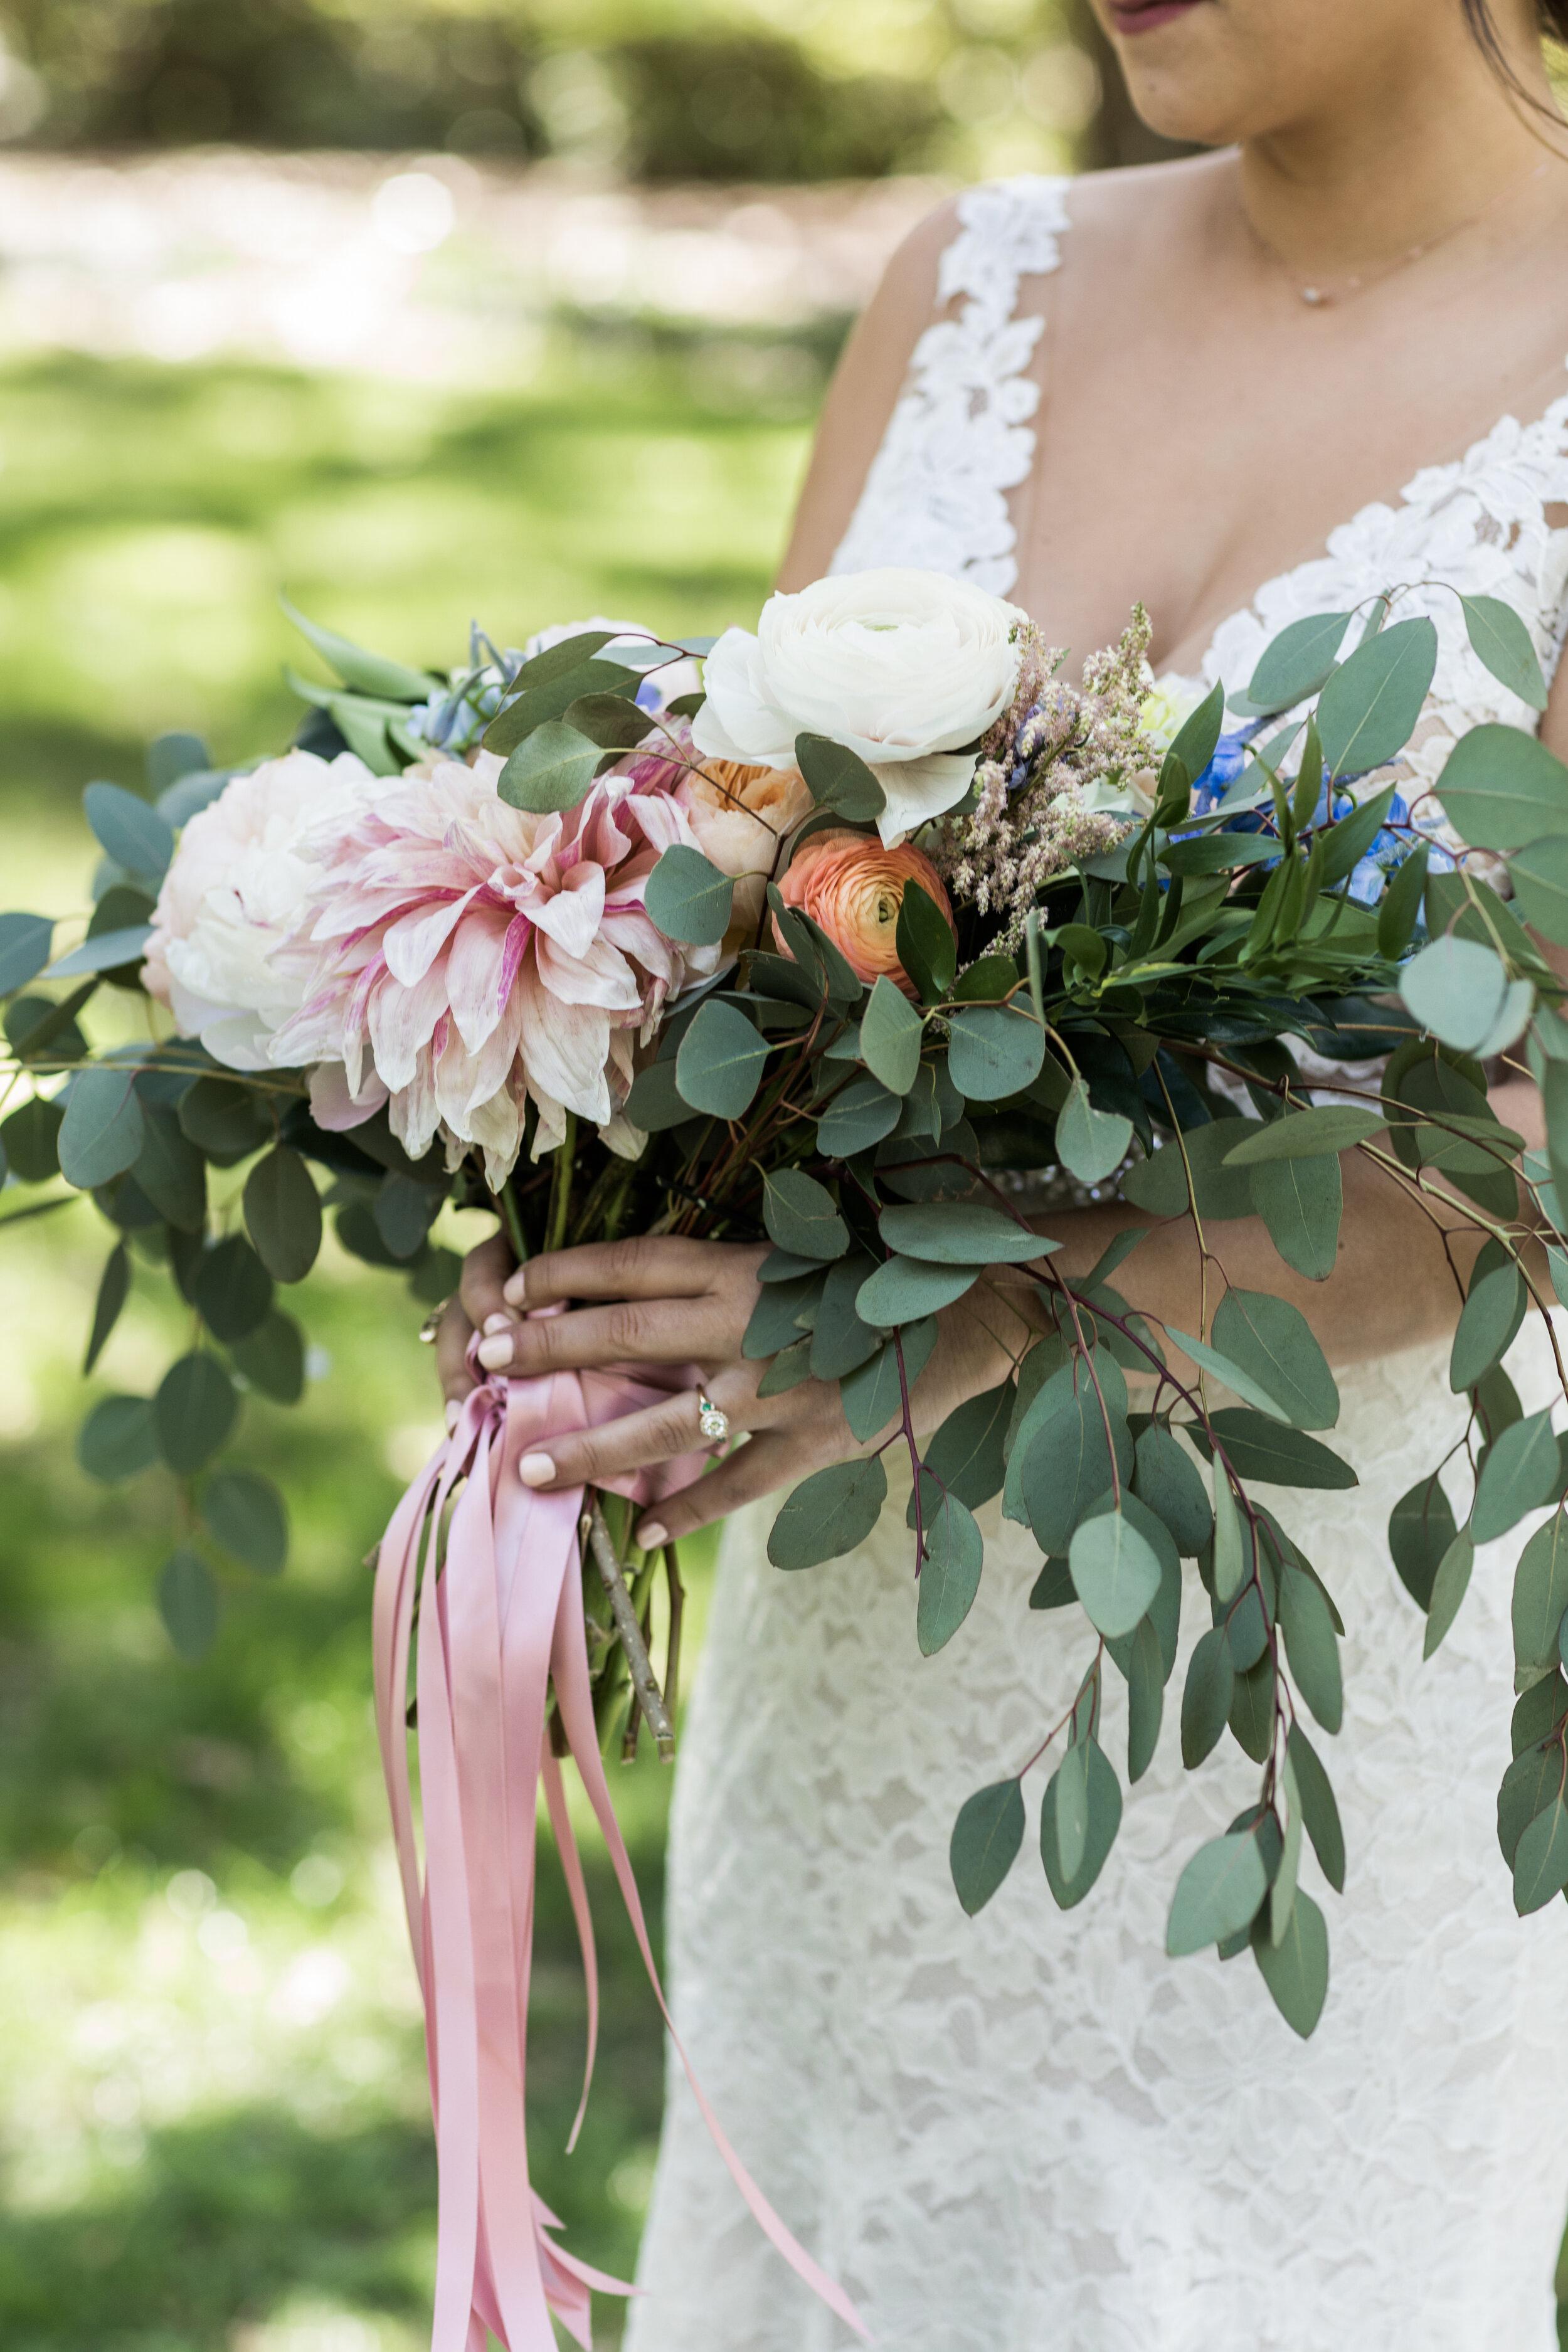 ivory-and-beau-blog-weddings-ivory-and-beau-couple-dominique-and-andres-savannah-florist-wedding-planning-savannah-bridal-boutique-wedding-flowers-KIP_WEBERWEDDING_RAILROADMUSEUM-439.JPG